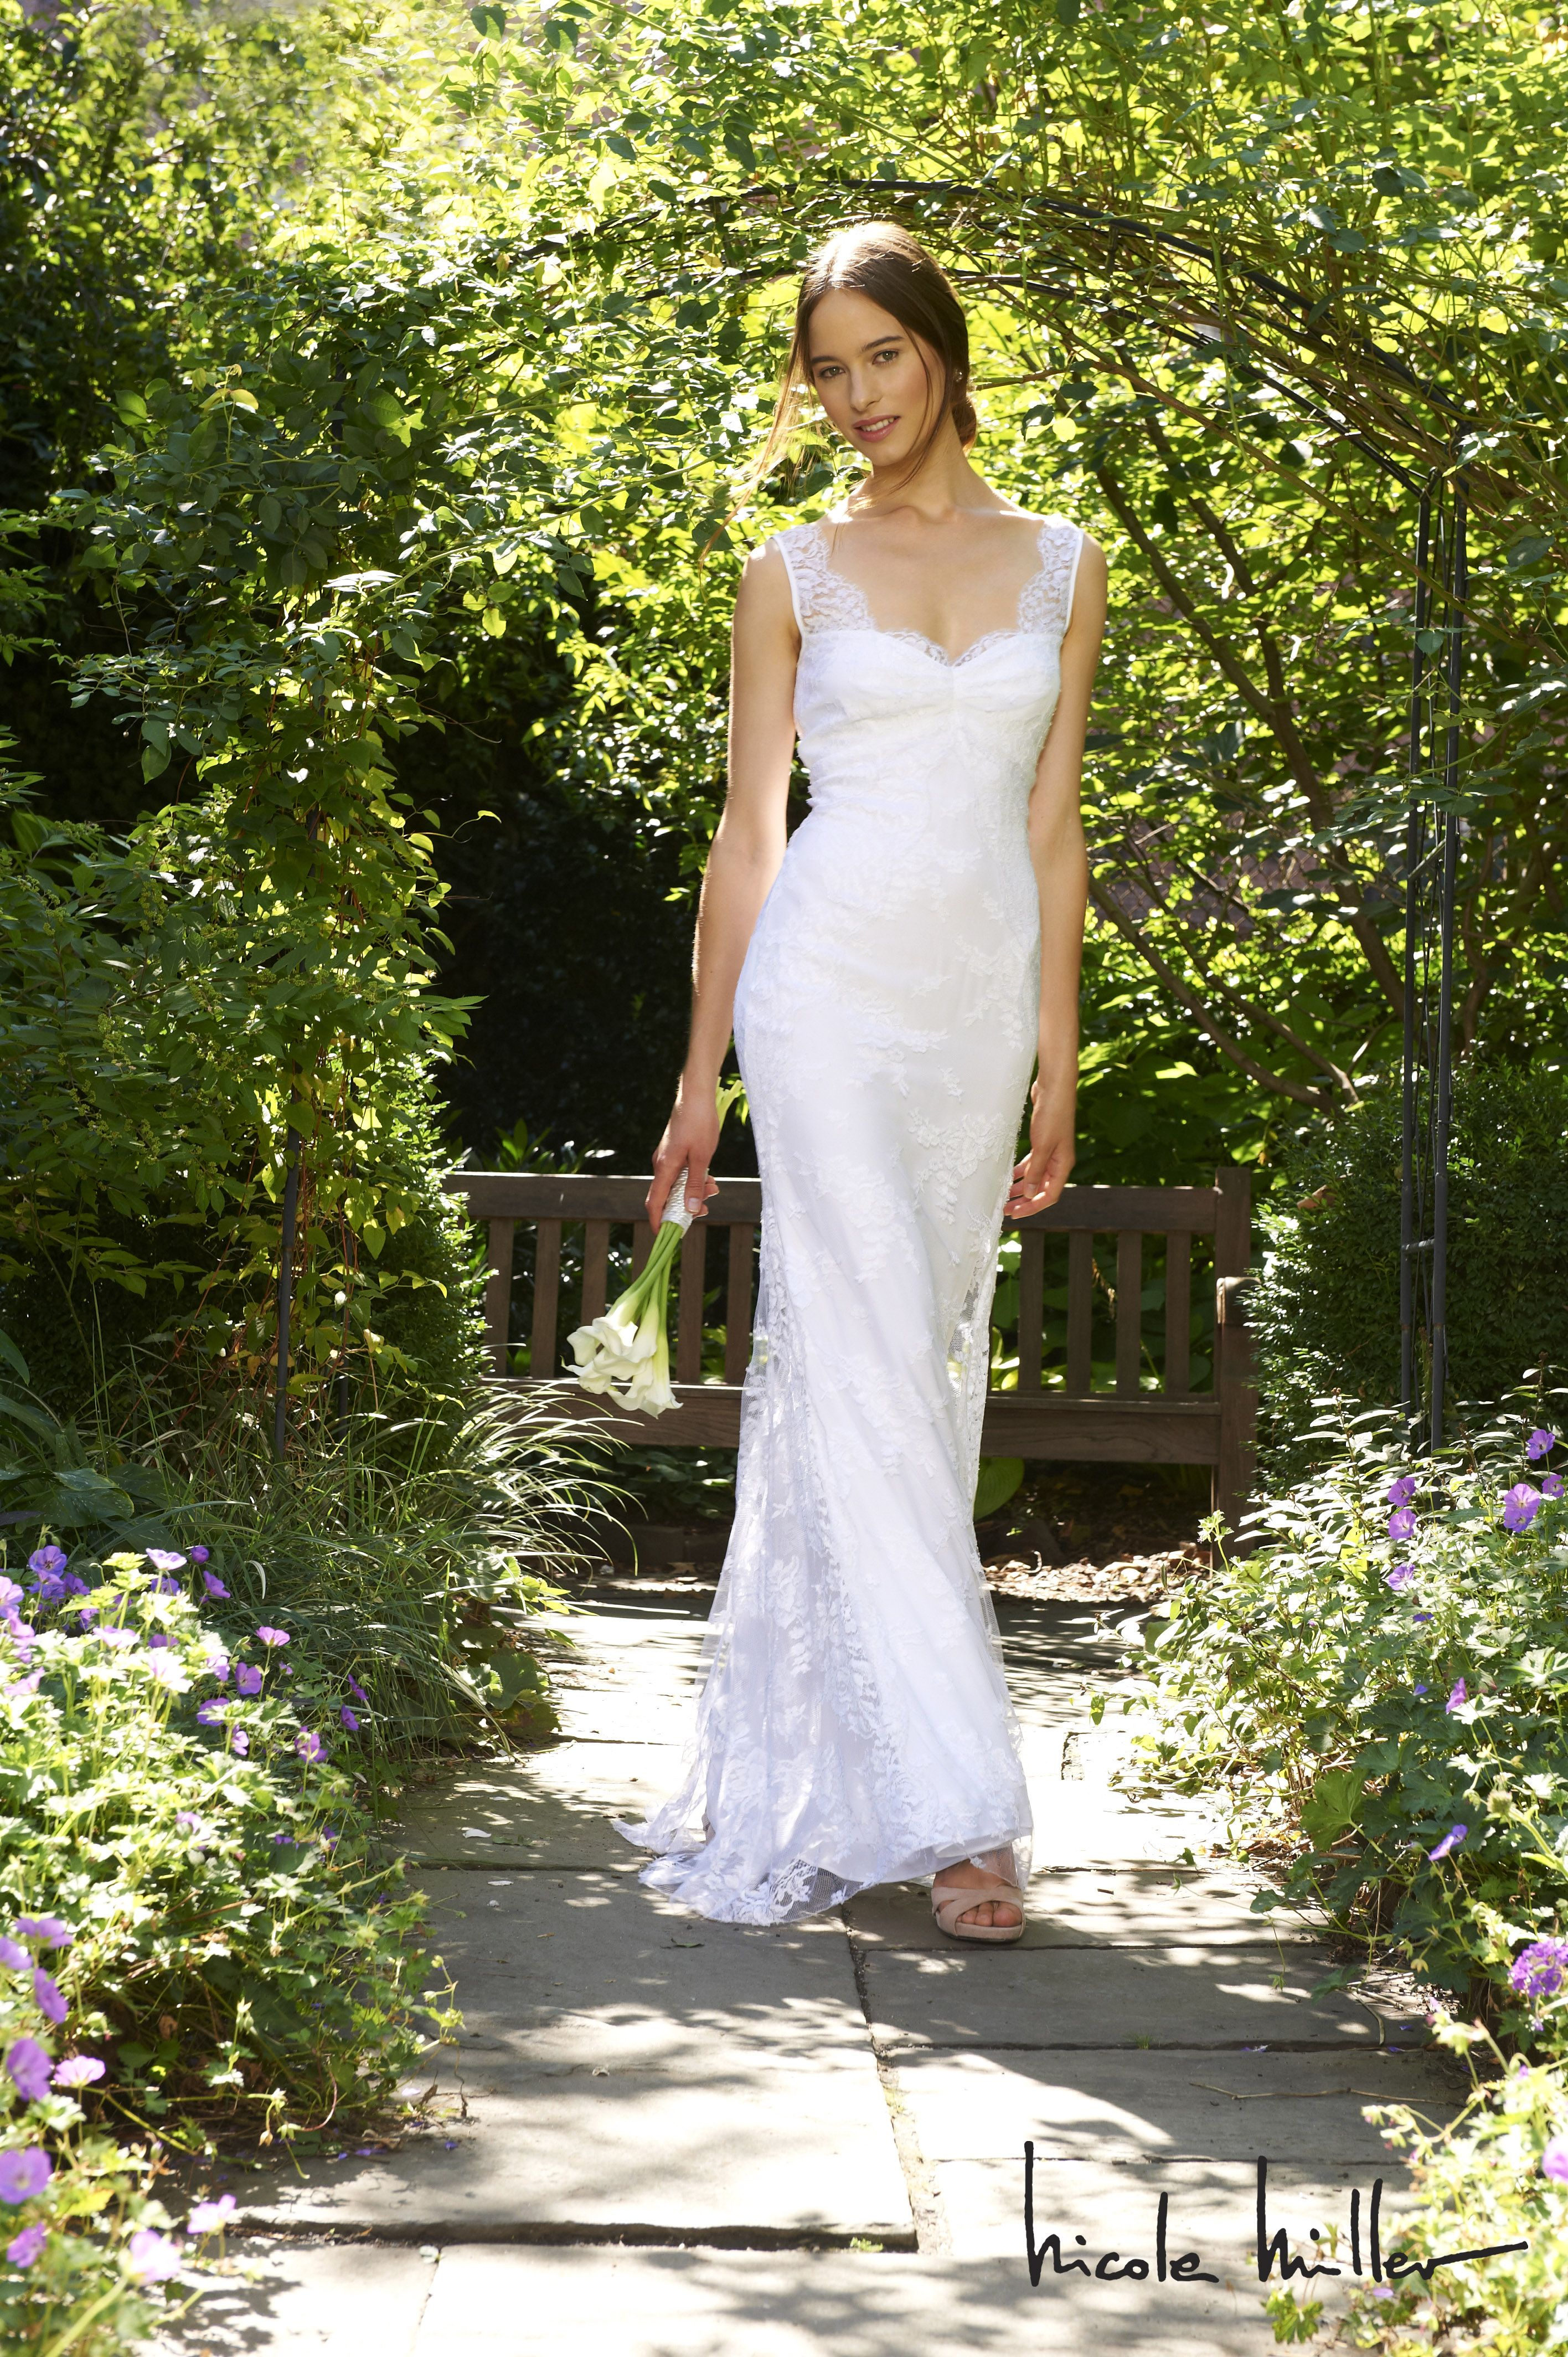 Nicole Miller Wedding Gowns 2012